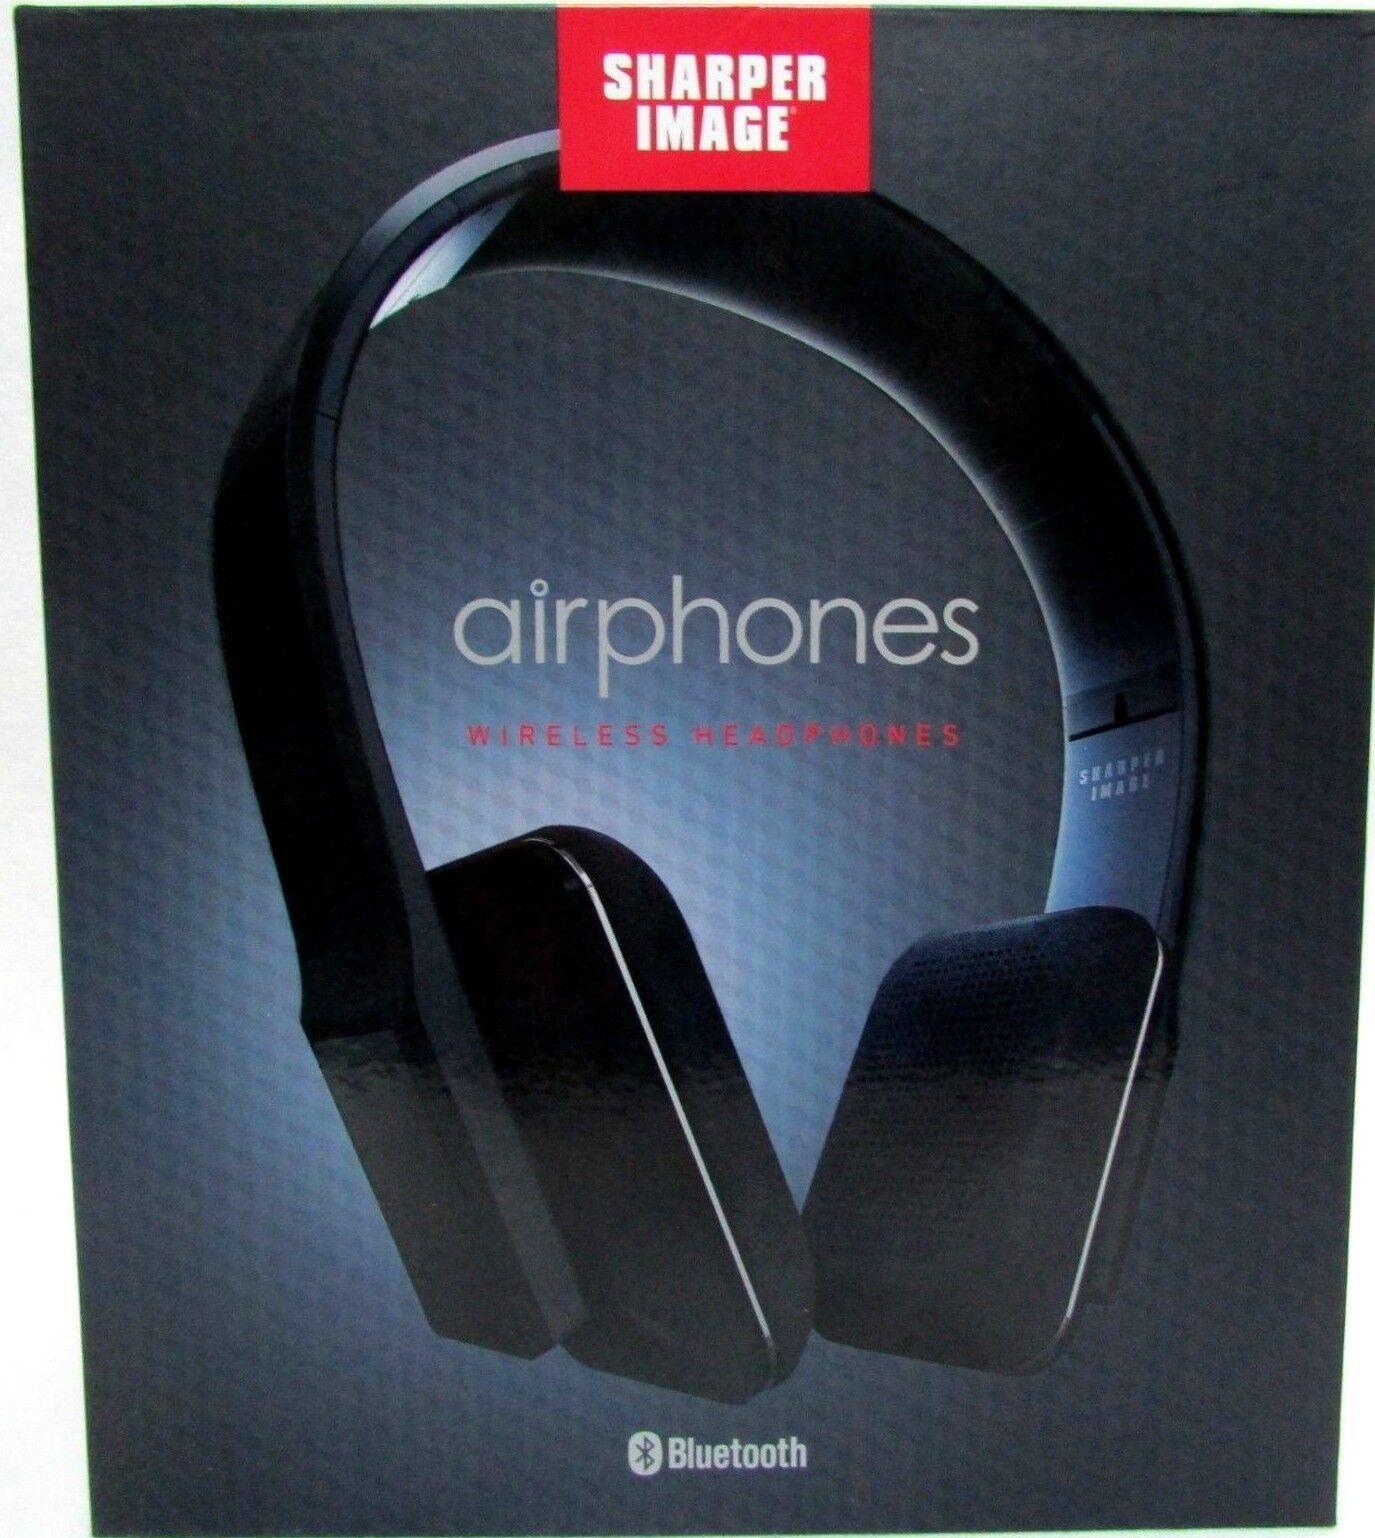 Sharper Image Sbt556bk Premium Hd Bluetooth Headphones With Built In